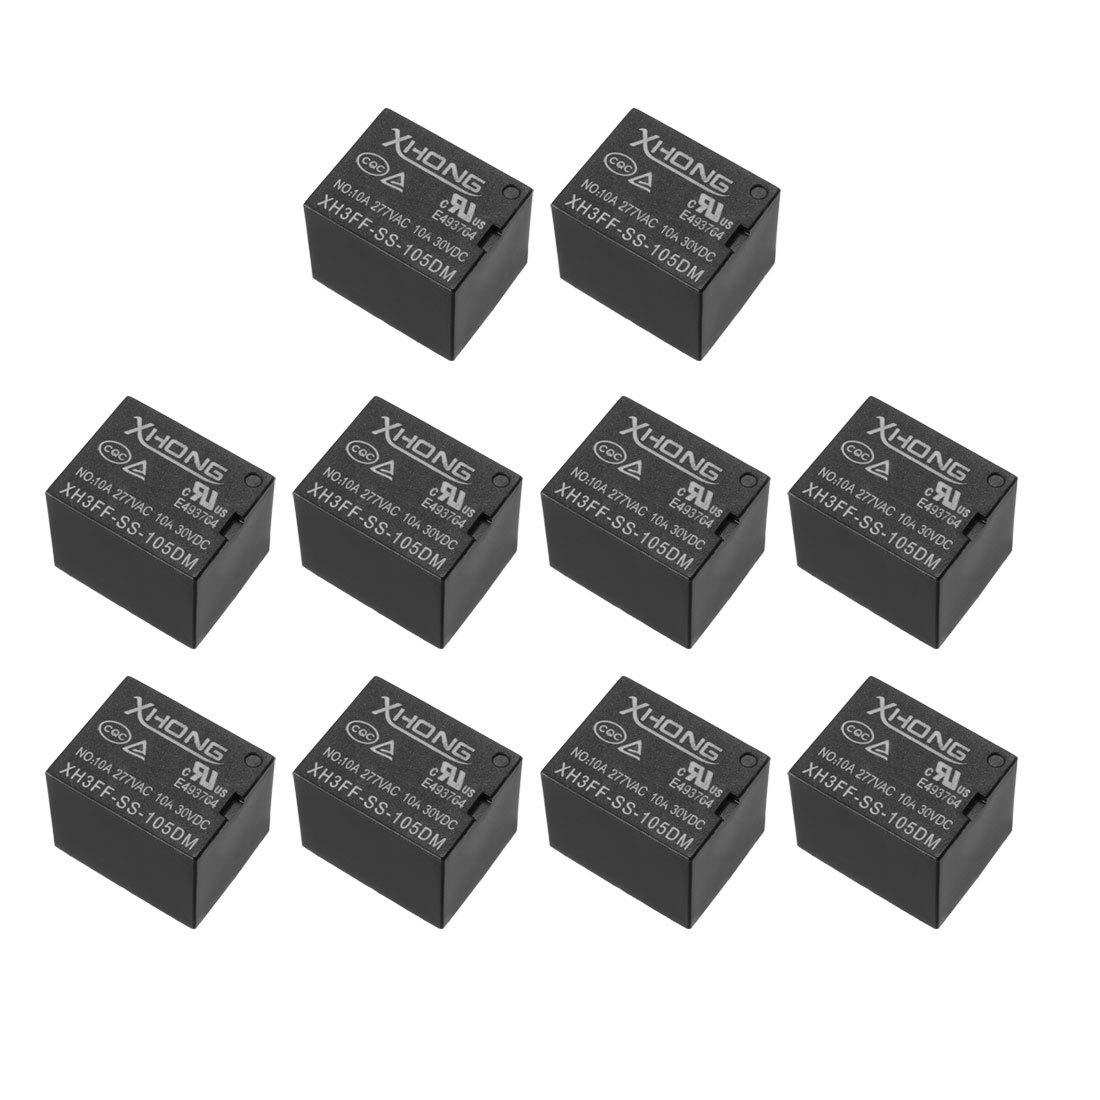 uxcell DC5V Coil 4Pin Mini PCB Electromagnetic Power Relay XH3FF-SS-105D 10A 277VAC 10A 30VDC 10Pcs